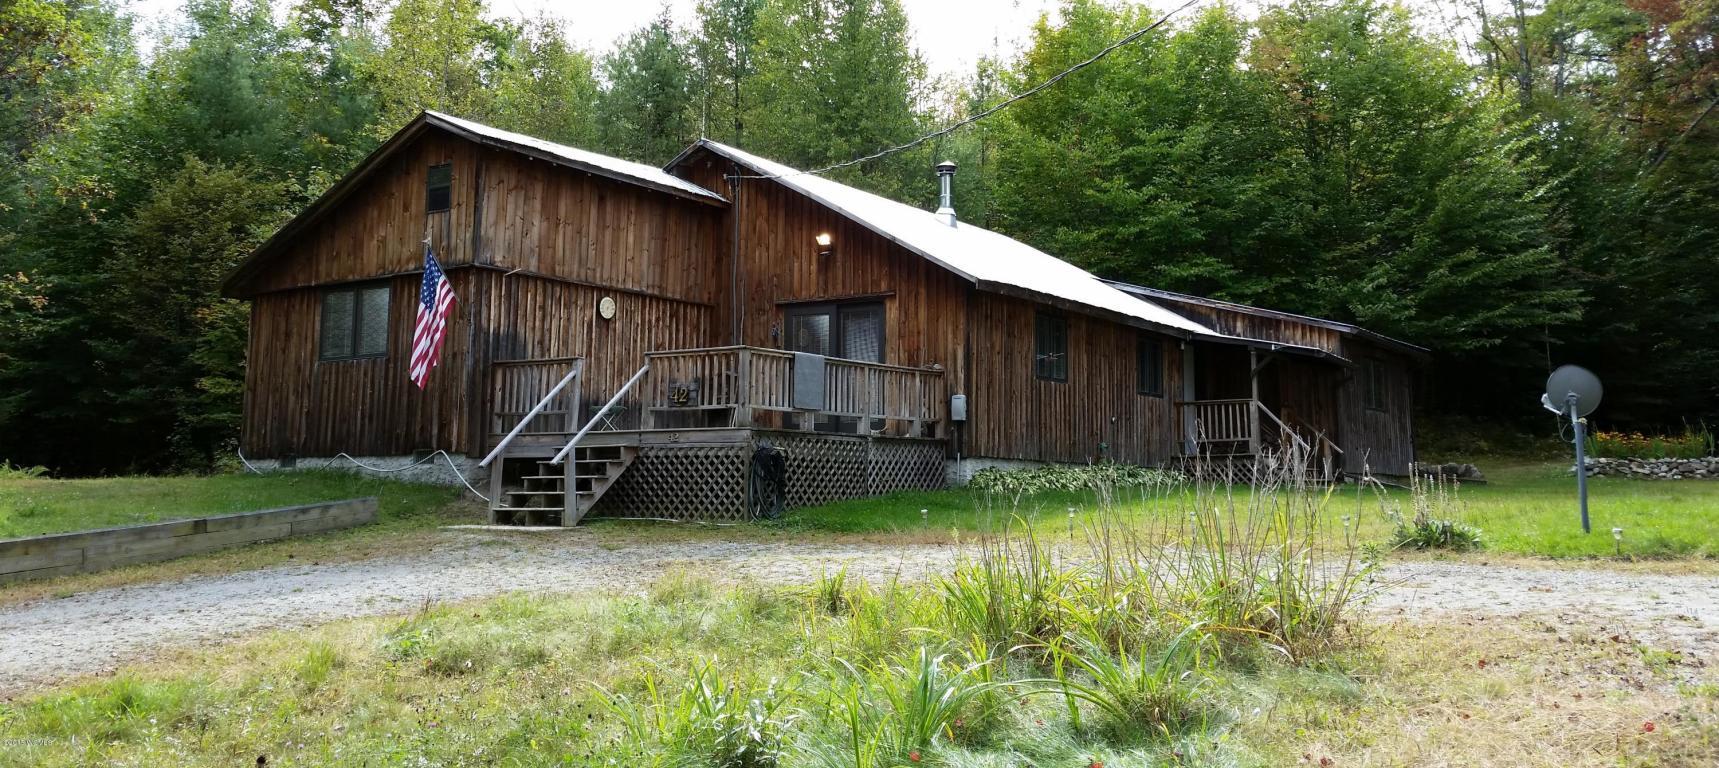 Real Estate for Sale, ListingId: 35573740, Brant Lake,NY12815